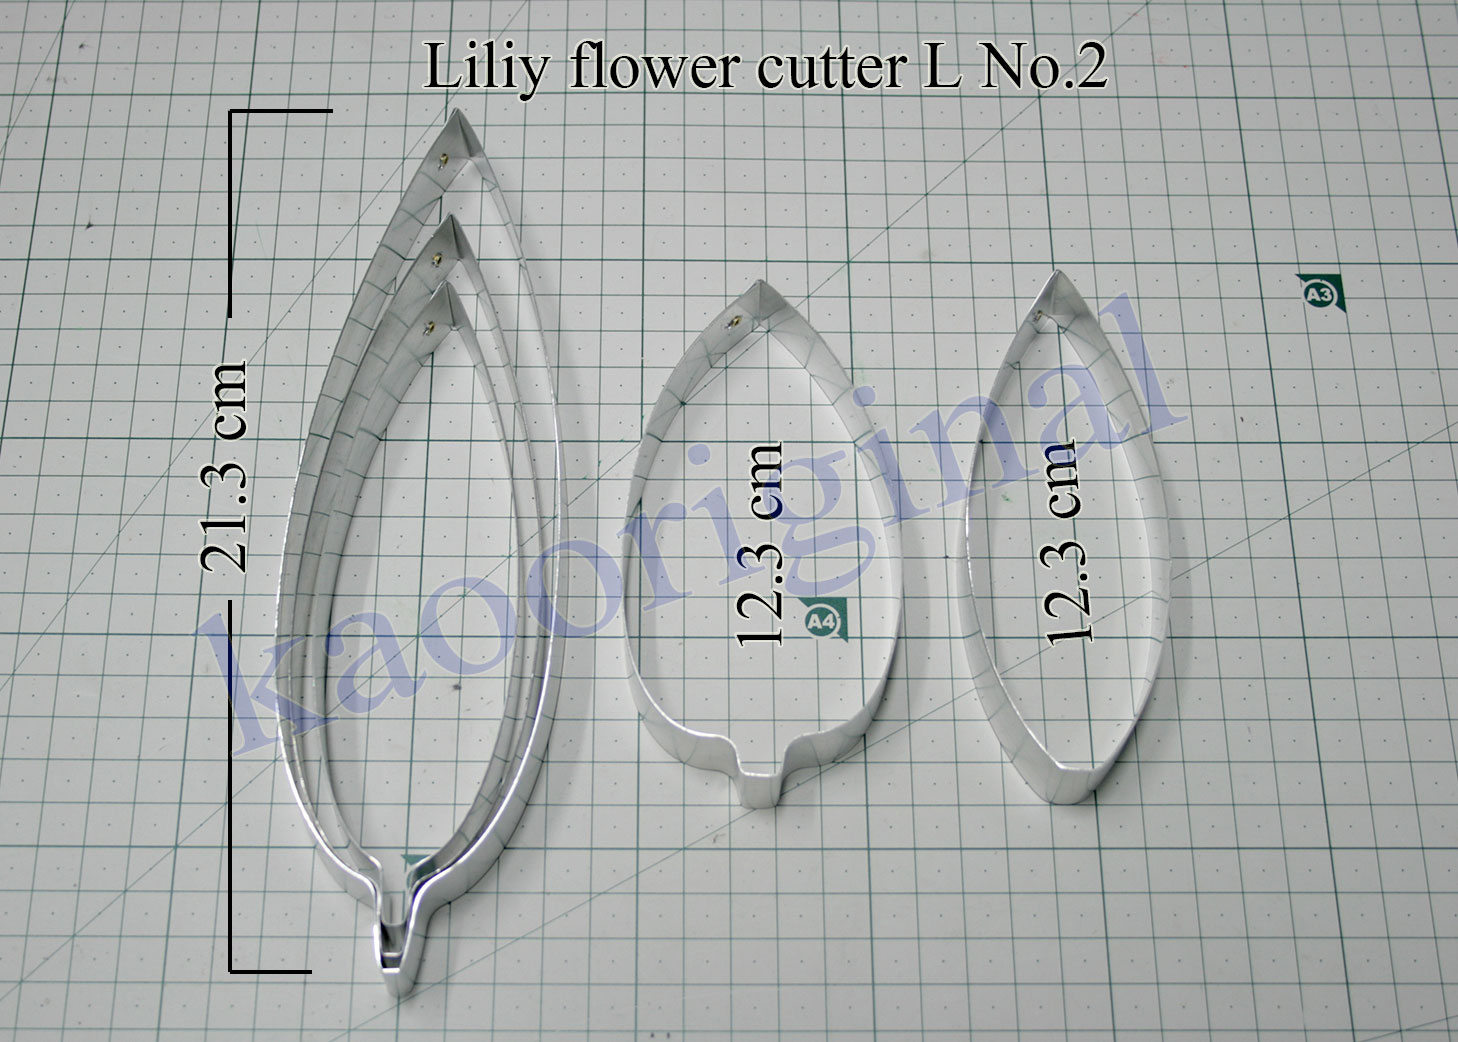 Lily flower S M L complete set <br> ดอกลิลลี่ S M L ชุดสมบูรณ์ <br> SKU: 3503 - L No.2